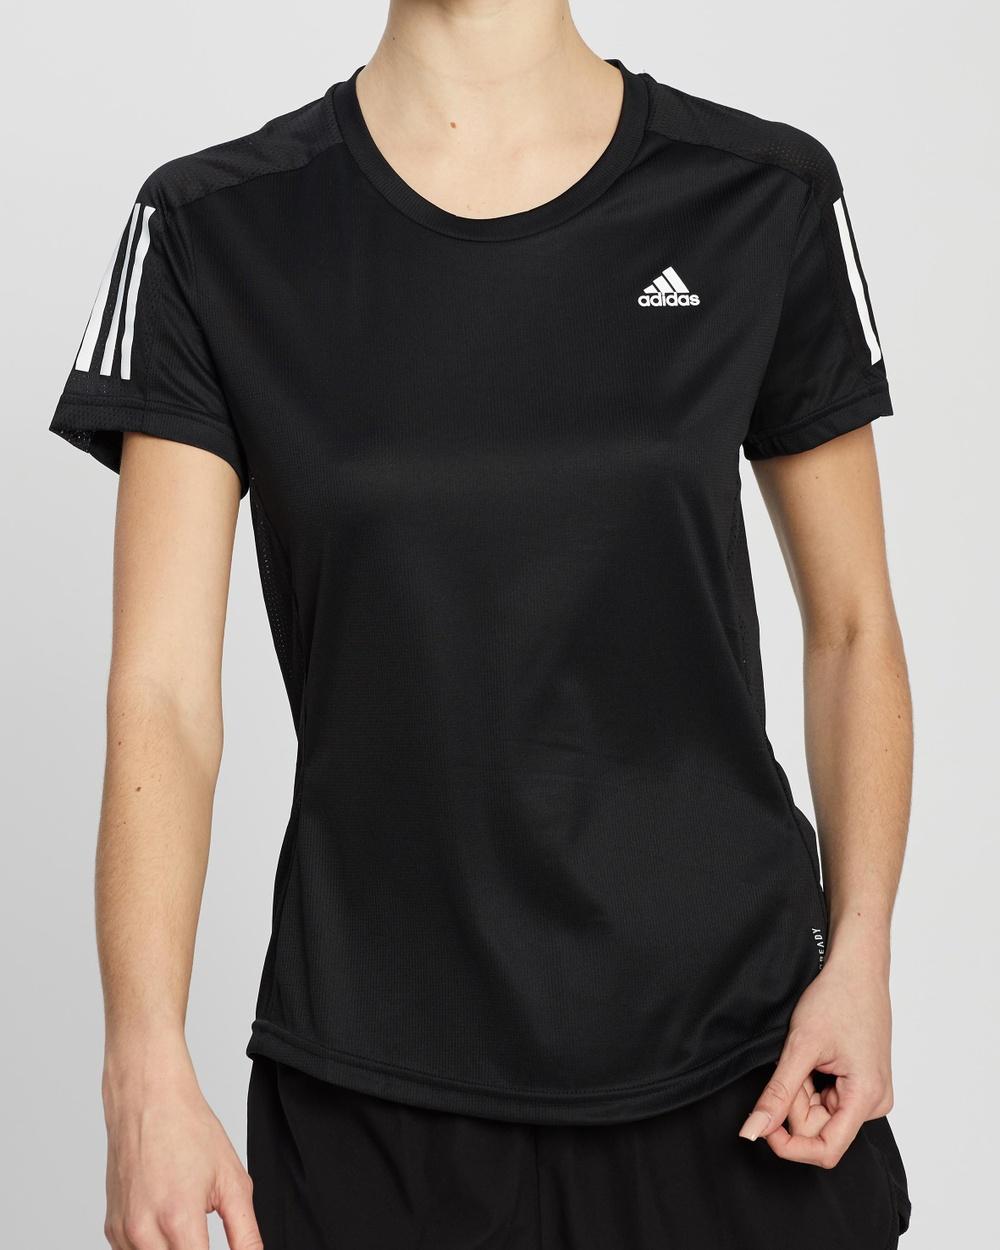 adidas Performance Own The Run Tee T-Shirts & Singlets Black